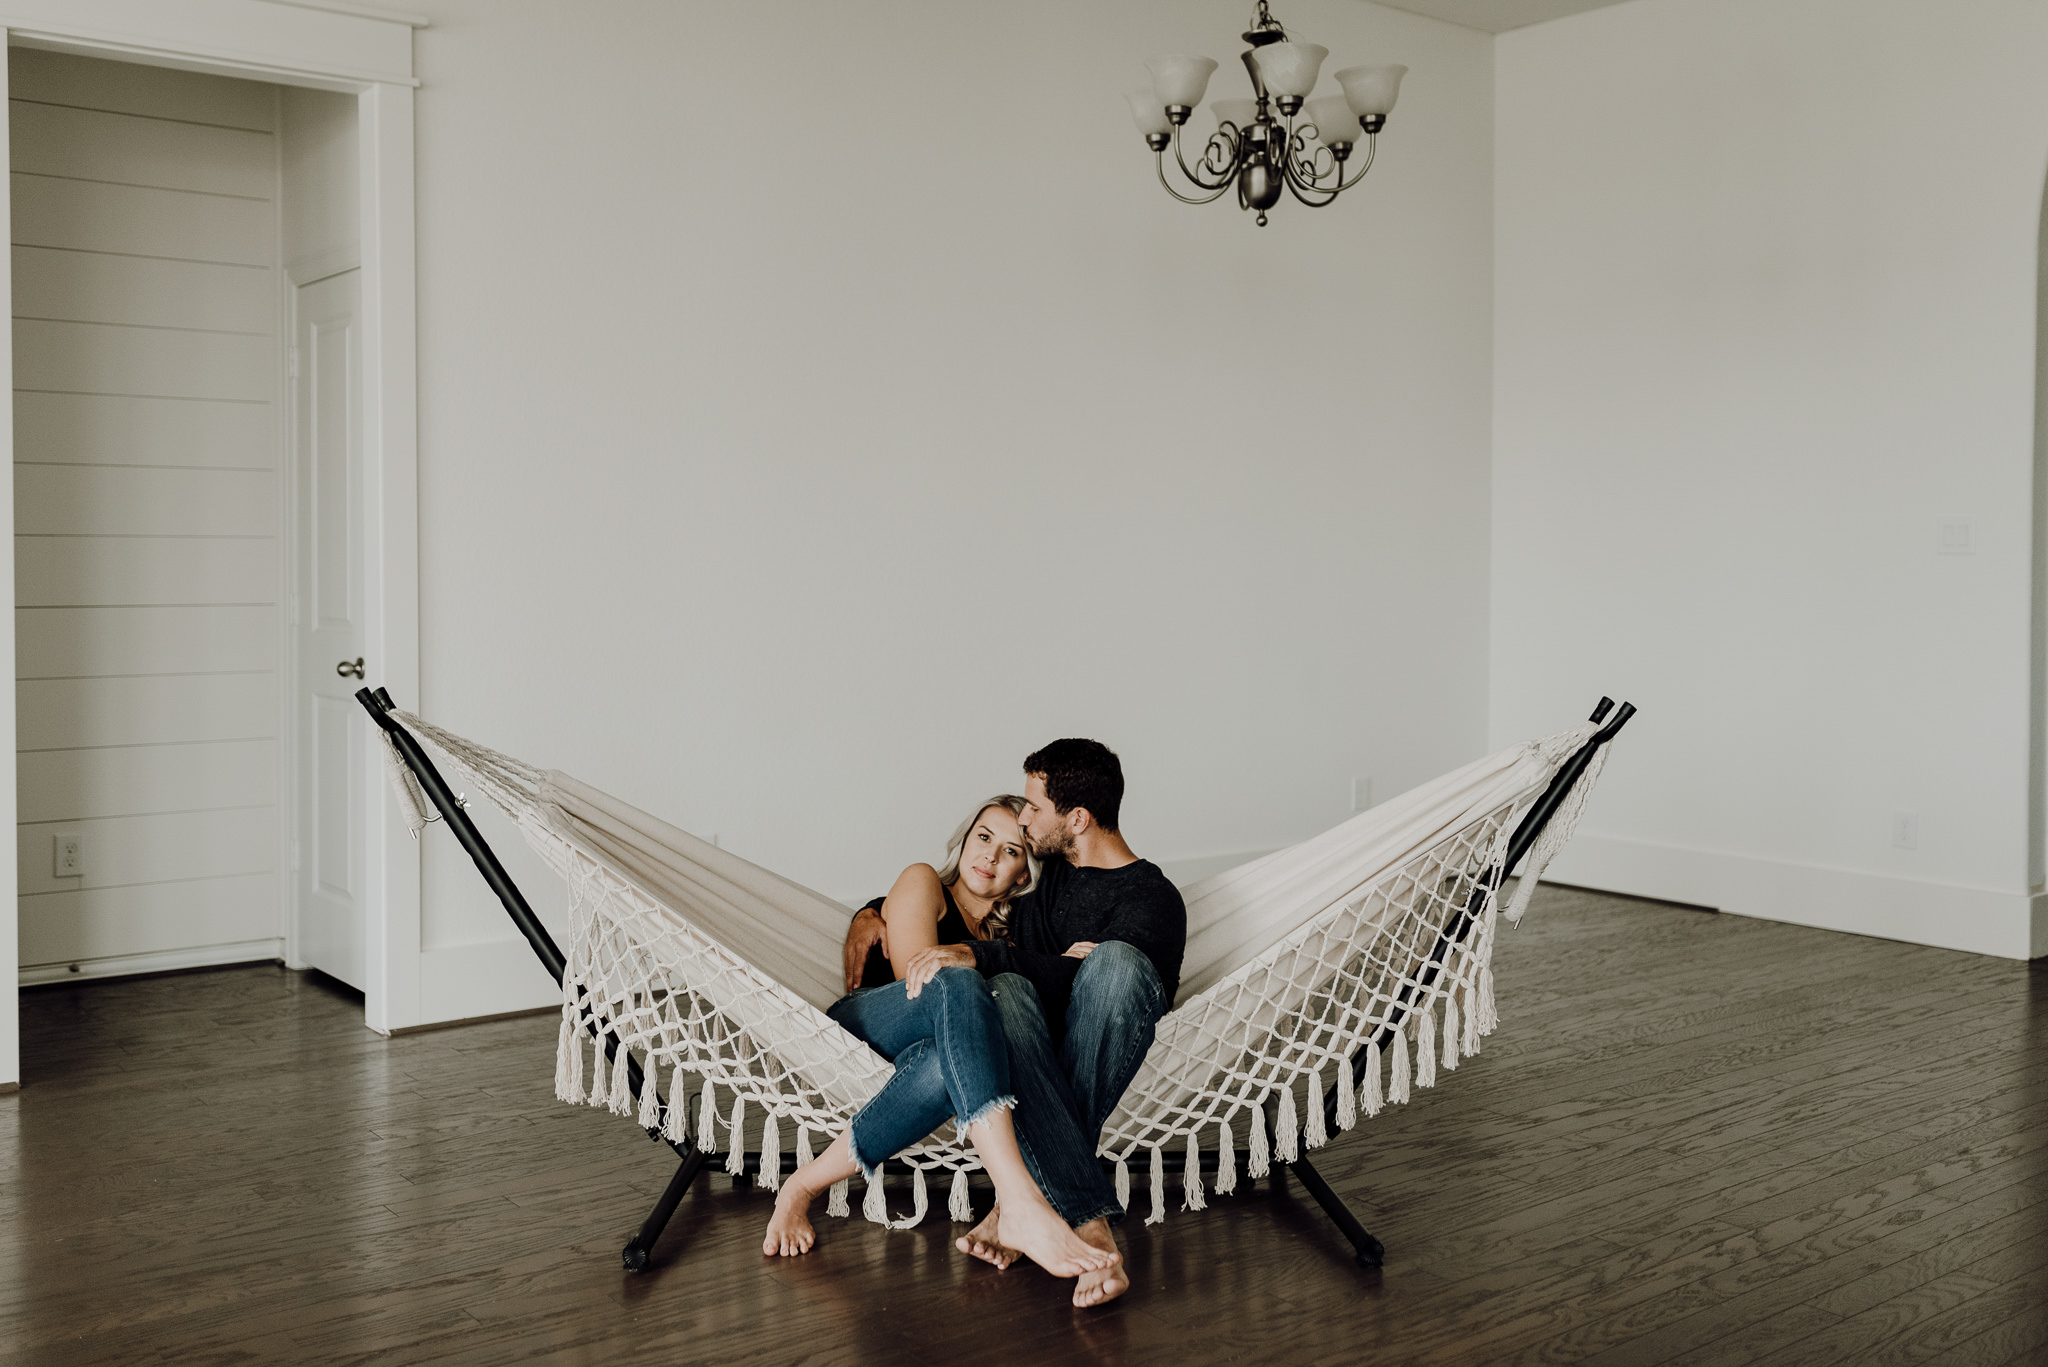 Houston Wedding Photographer-Houston In Home Engagement Session- Houston Wedding Photographer -Kristen Giles Photography-10.jpg